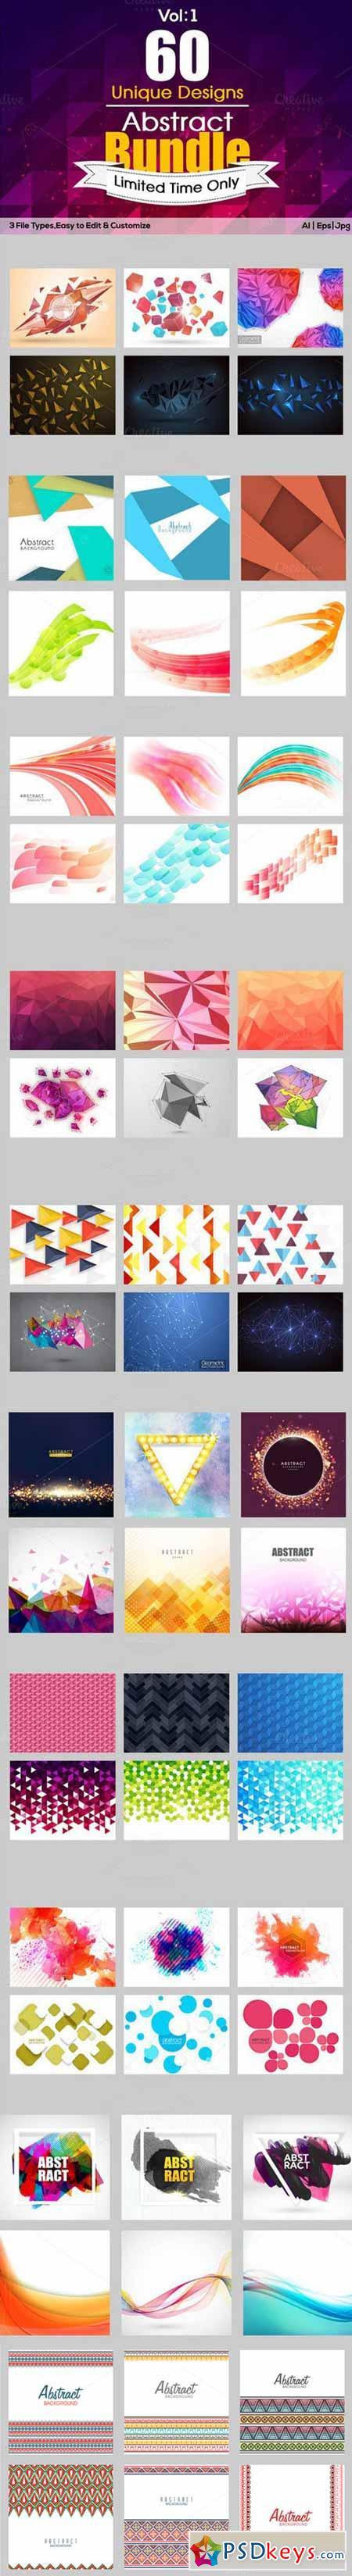 Creative Abstract Bundle - Vol 1 468546